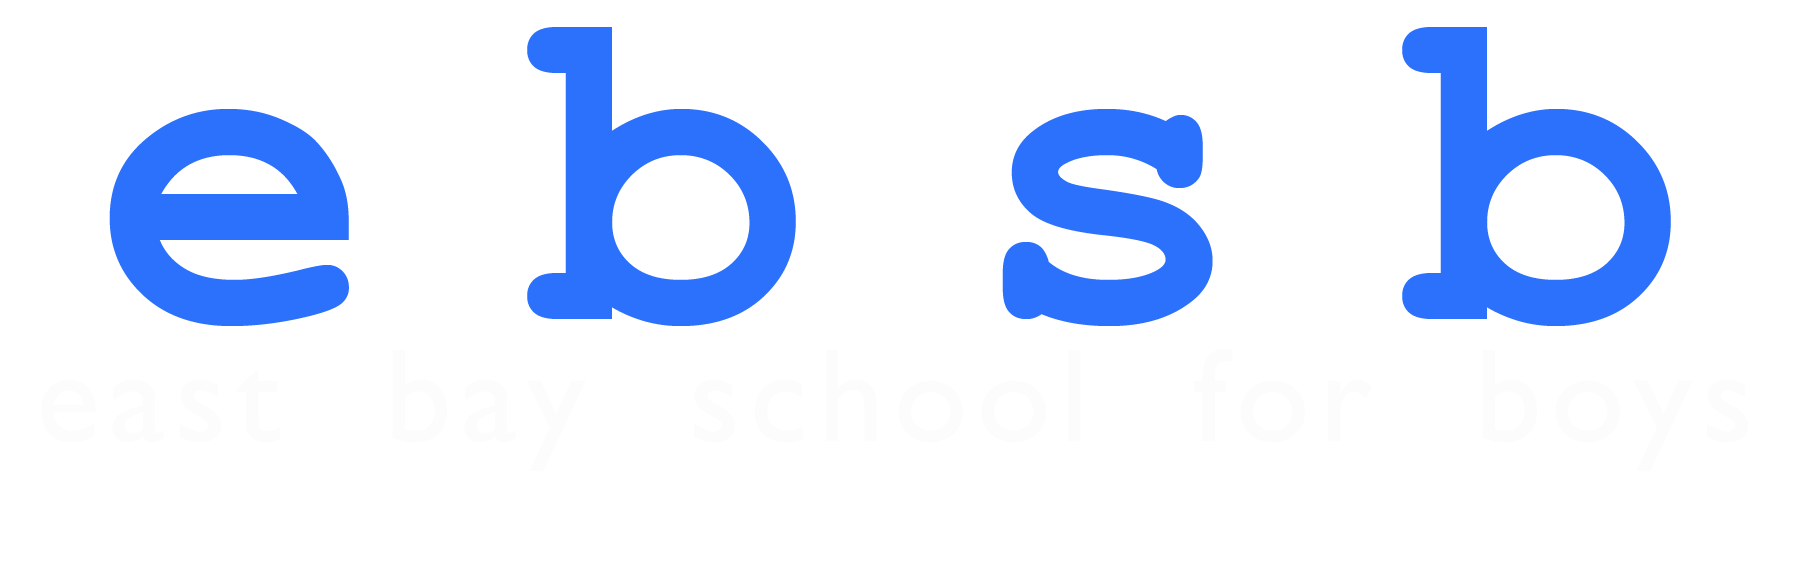 Bay school for boys east bay school for boys biocorpaavc Images